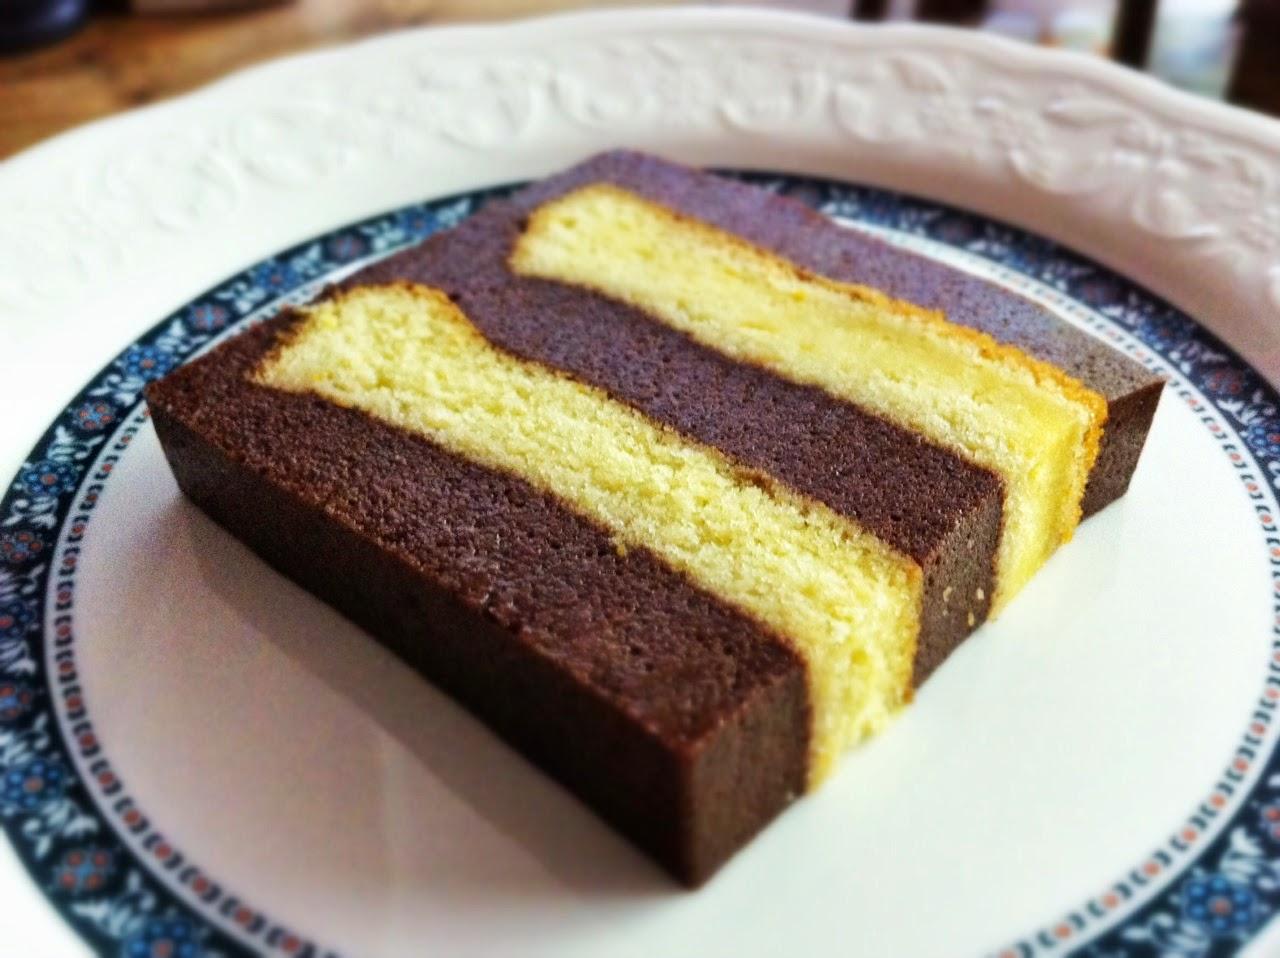 Orange And Chocolate Pudding Layer Cake